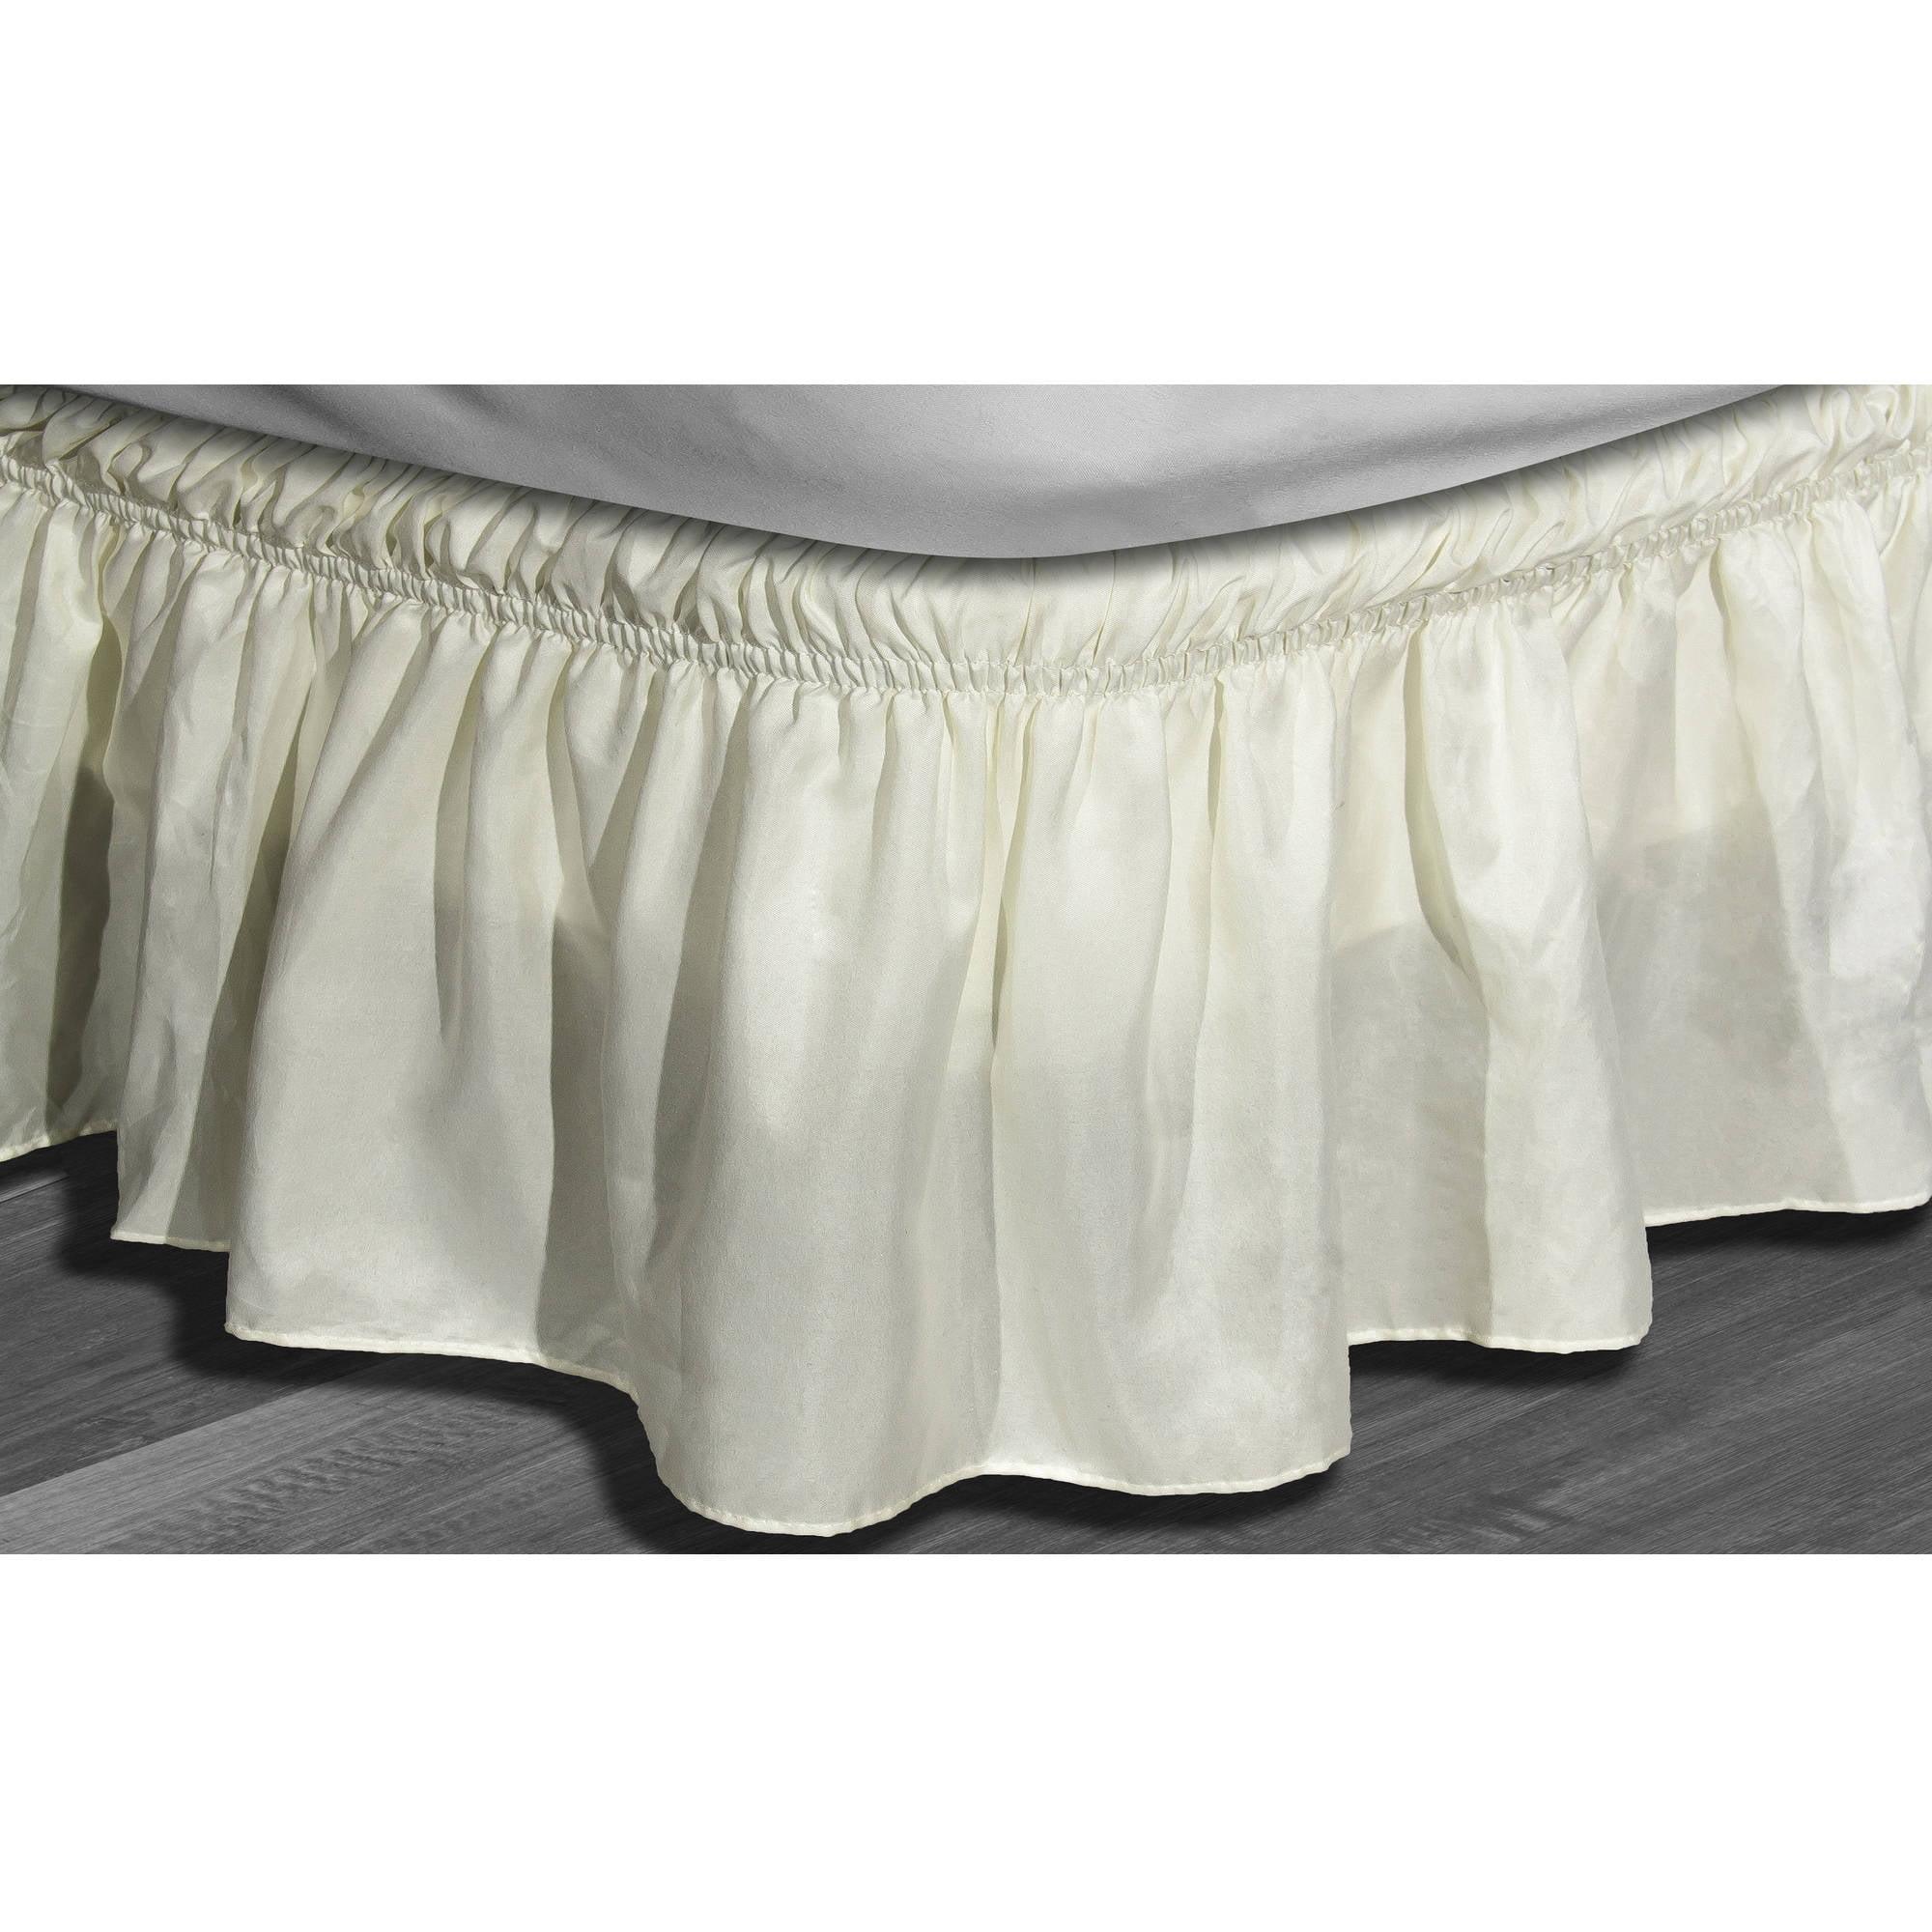 Waldorf Microfiber Bed Ruffle Skirt